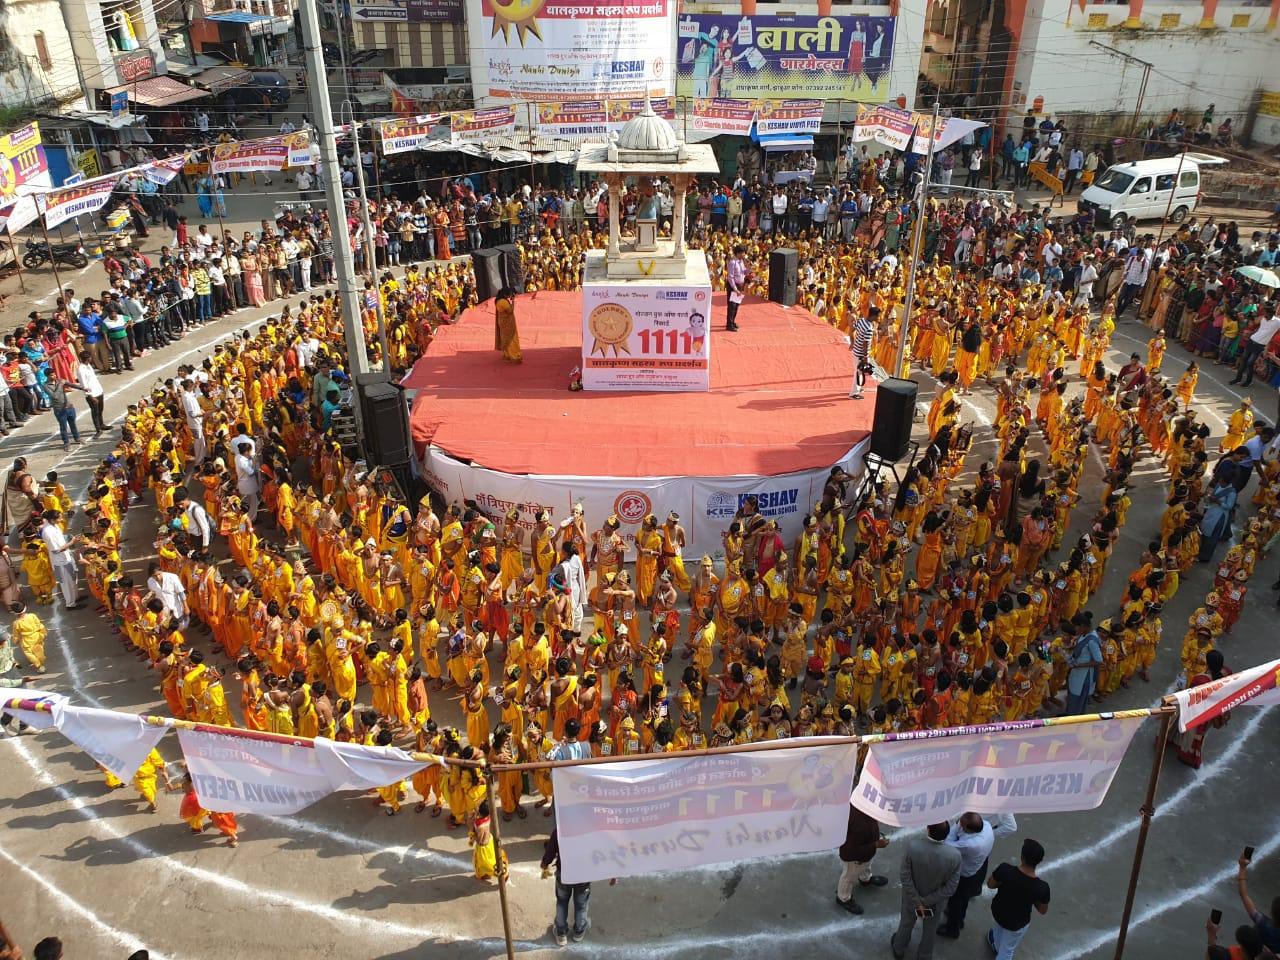 Jhabua news- Sharda Group of Education Students enter Krishna's name in Guinness Book of World Records-गिनीज बुक ऑफ वर्ल्ड रिकॉर्ड में बच्चों ने कृष्ण बन अपना नाम दर्ज कराया